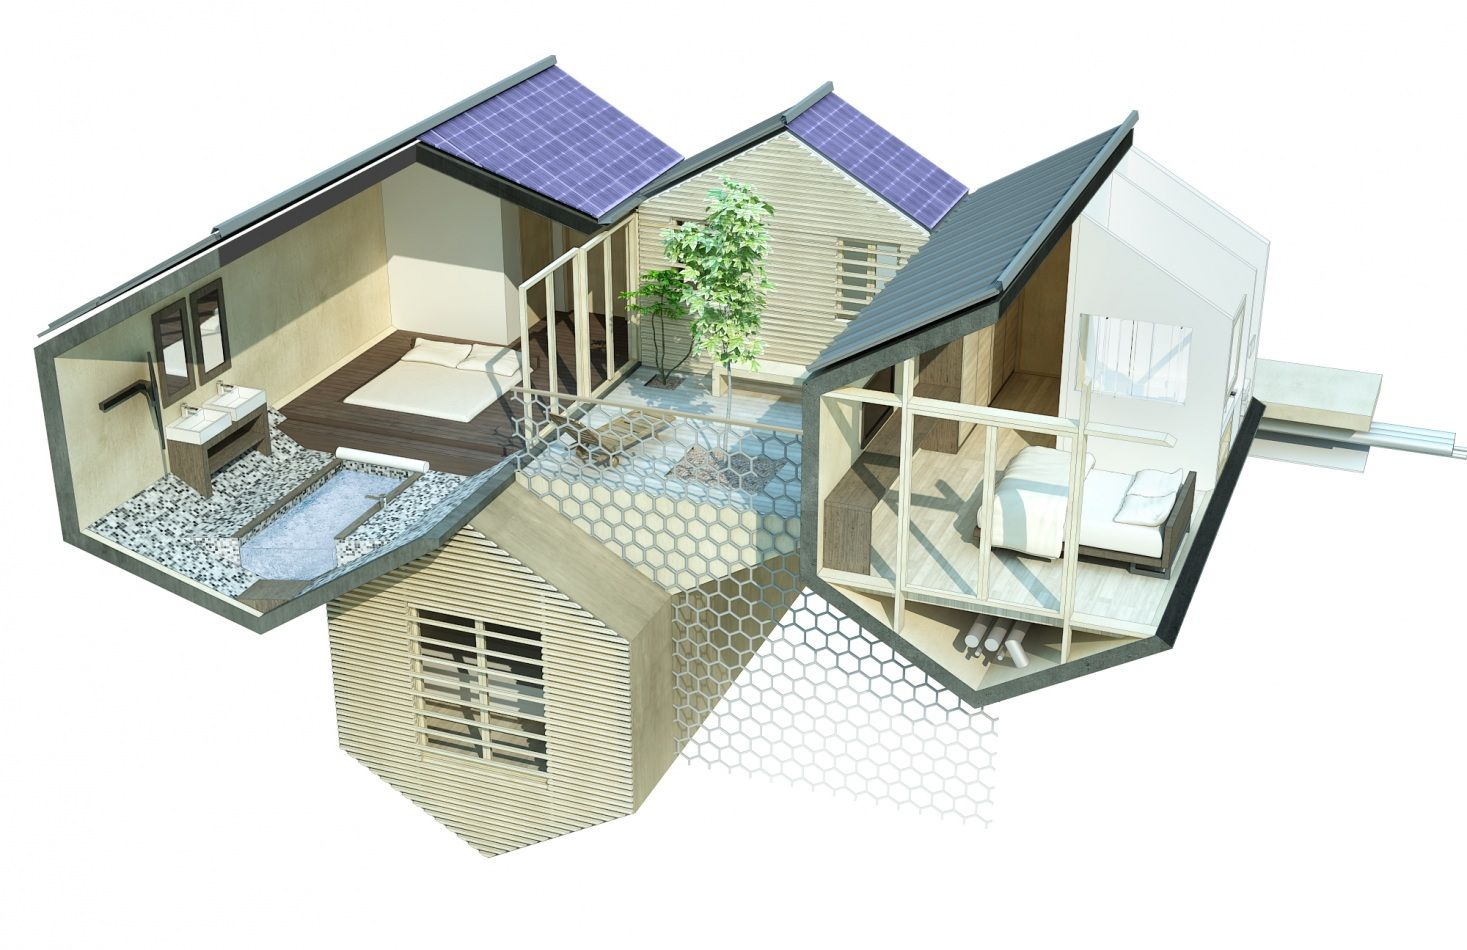 h tel spa bio modulaire de 70 chambres 2013 t design architecture architecture pinterest. Black Bedroom Furniture Sets. Home Design Ideas